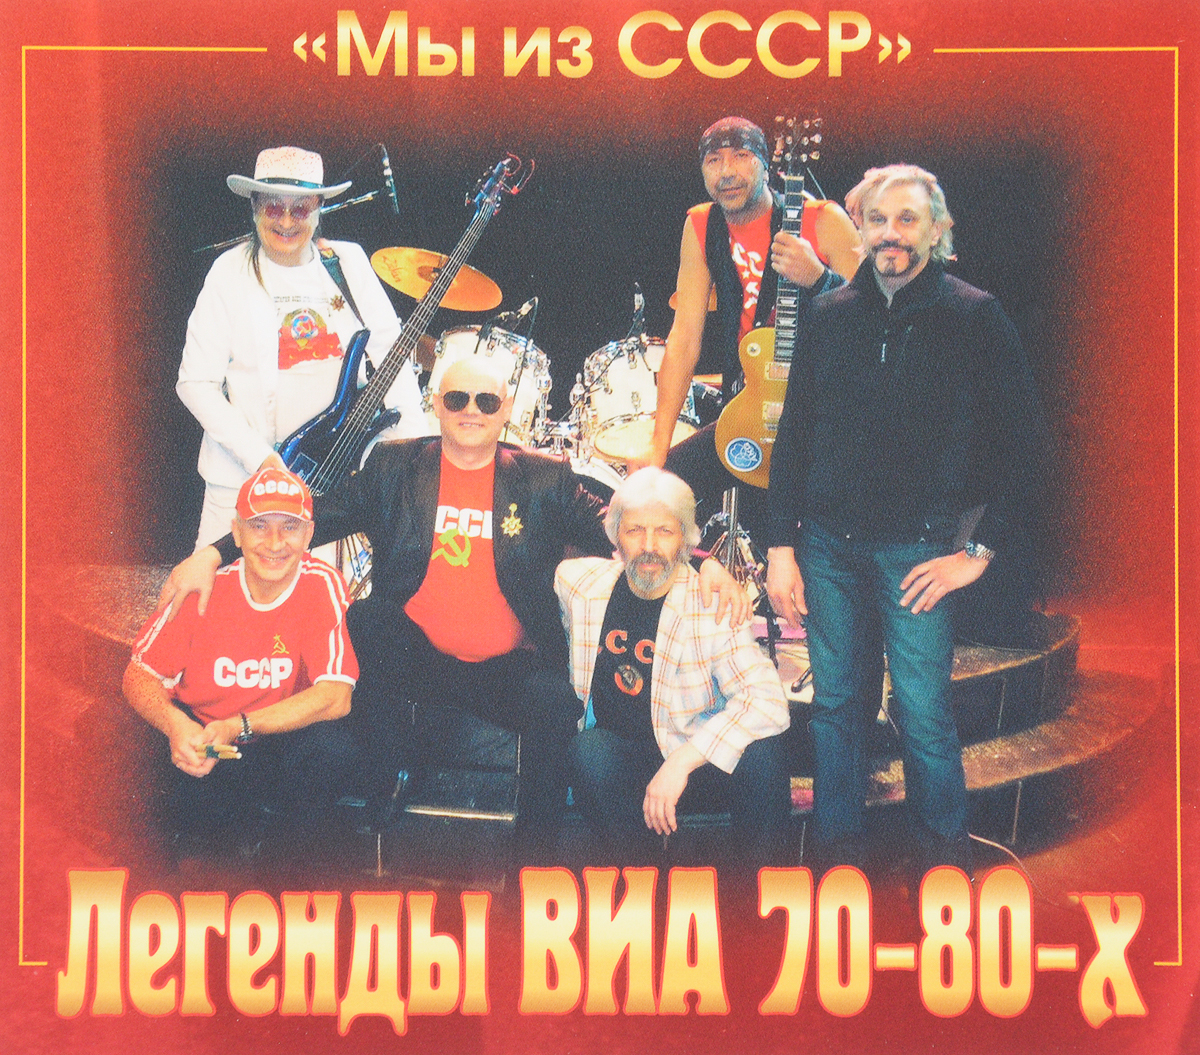 Легенды ВИА 70-80-х. Мы из СССР парад виа 70 80 х 2019 01 05t19 30